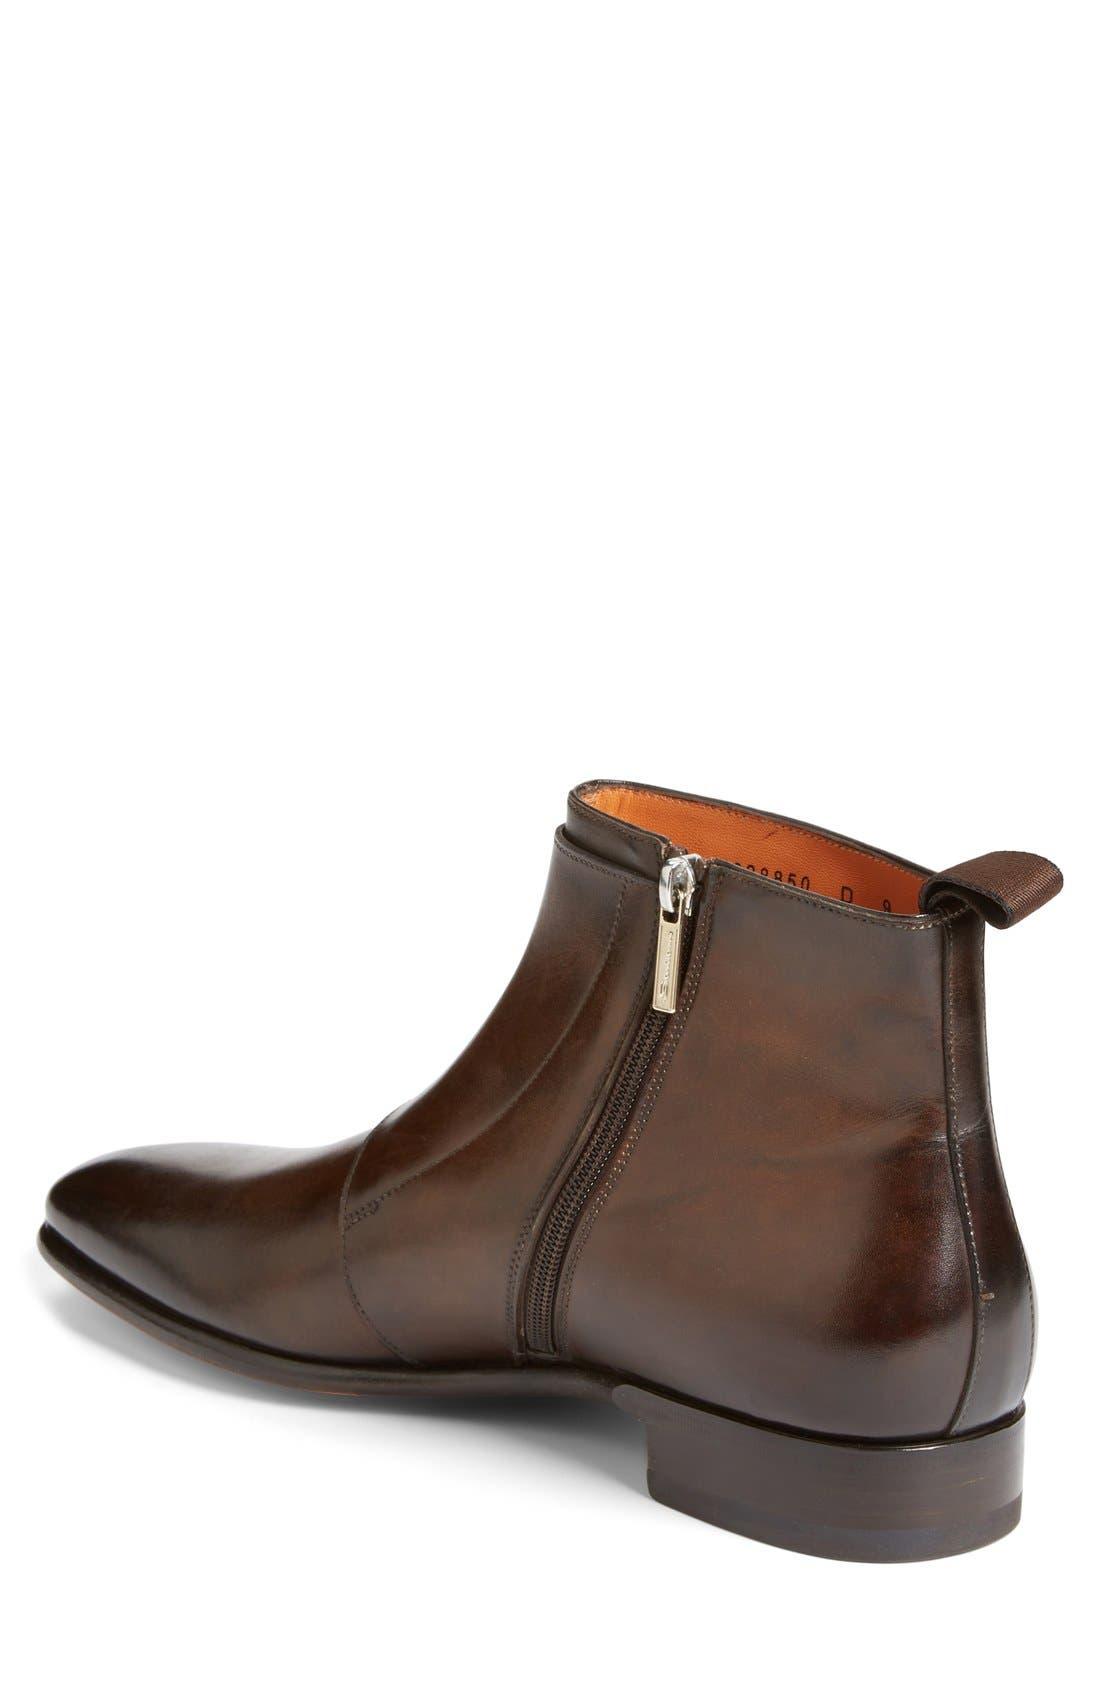 Alternate Image 2  - Santoni 'Ciro' Double Monk Strap Boot(Men)